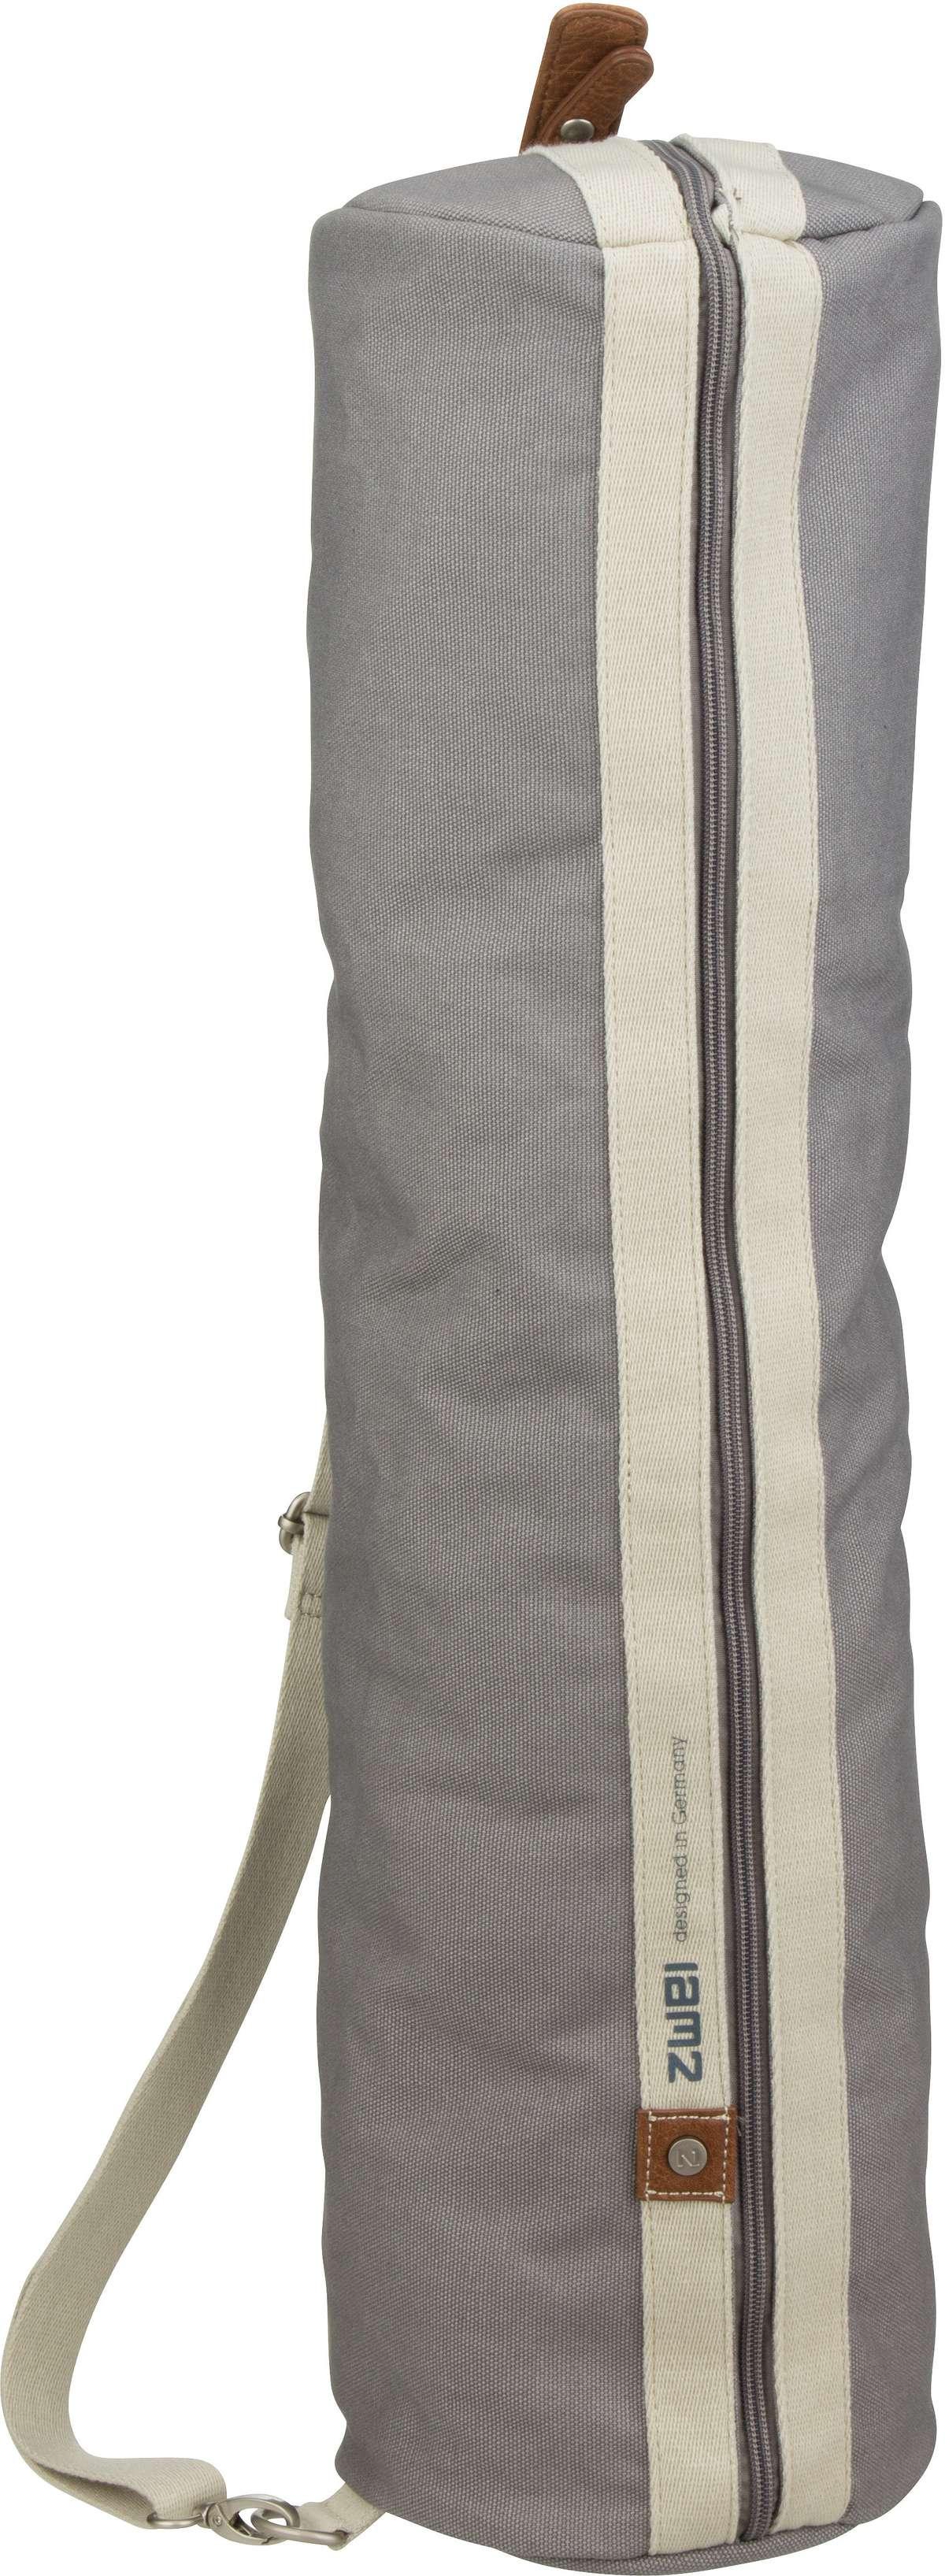 Rucksack / Daypack Yoga Y108 Grey (13 Liter)